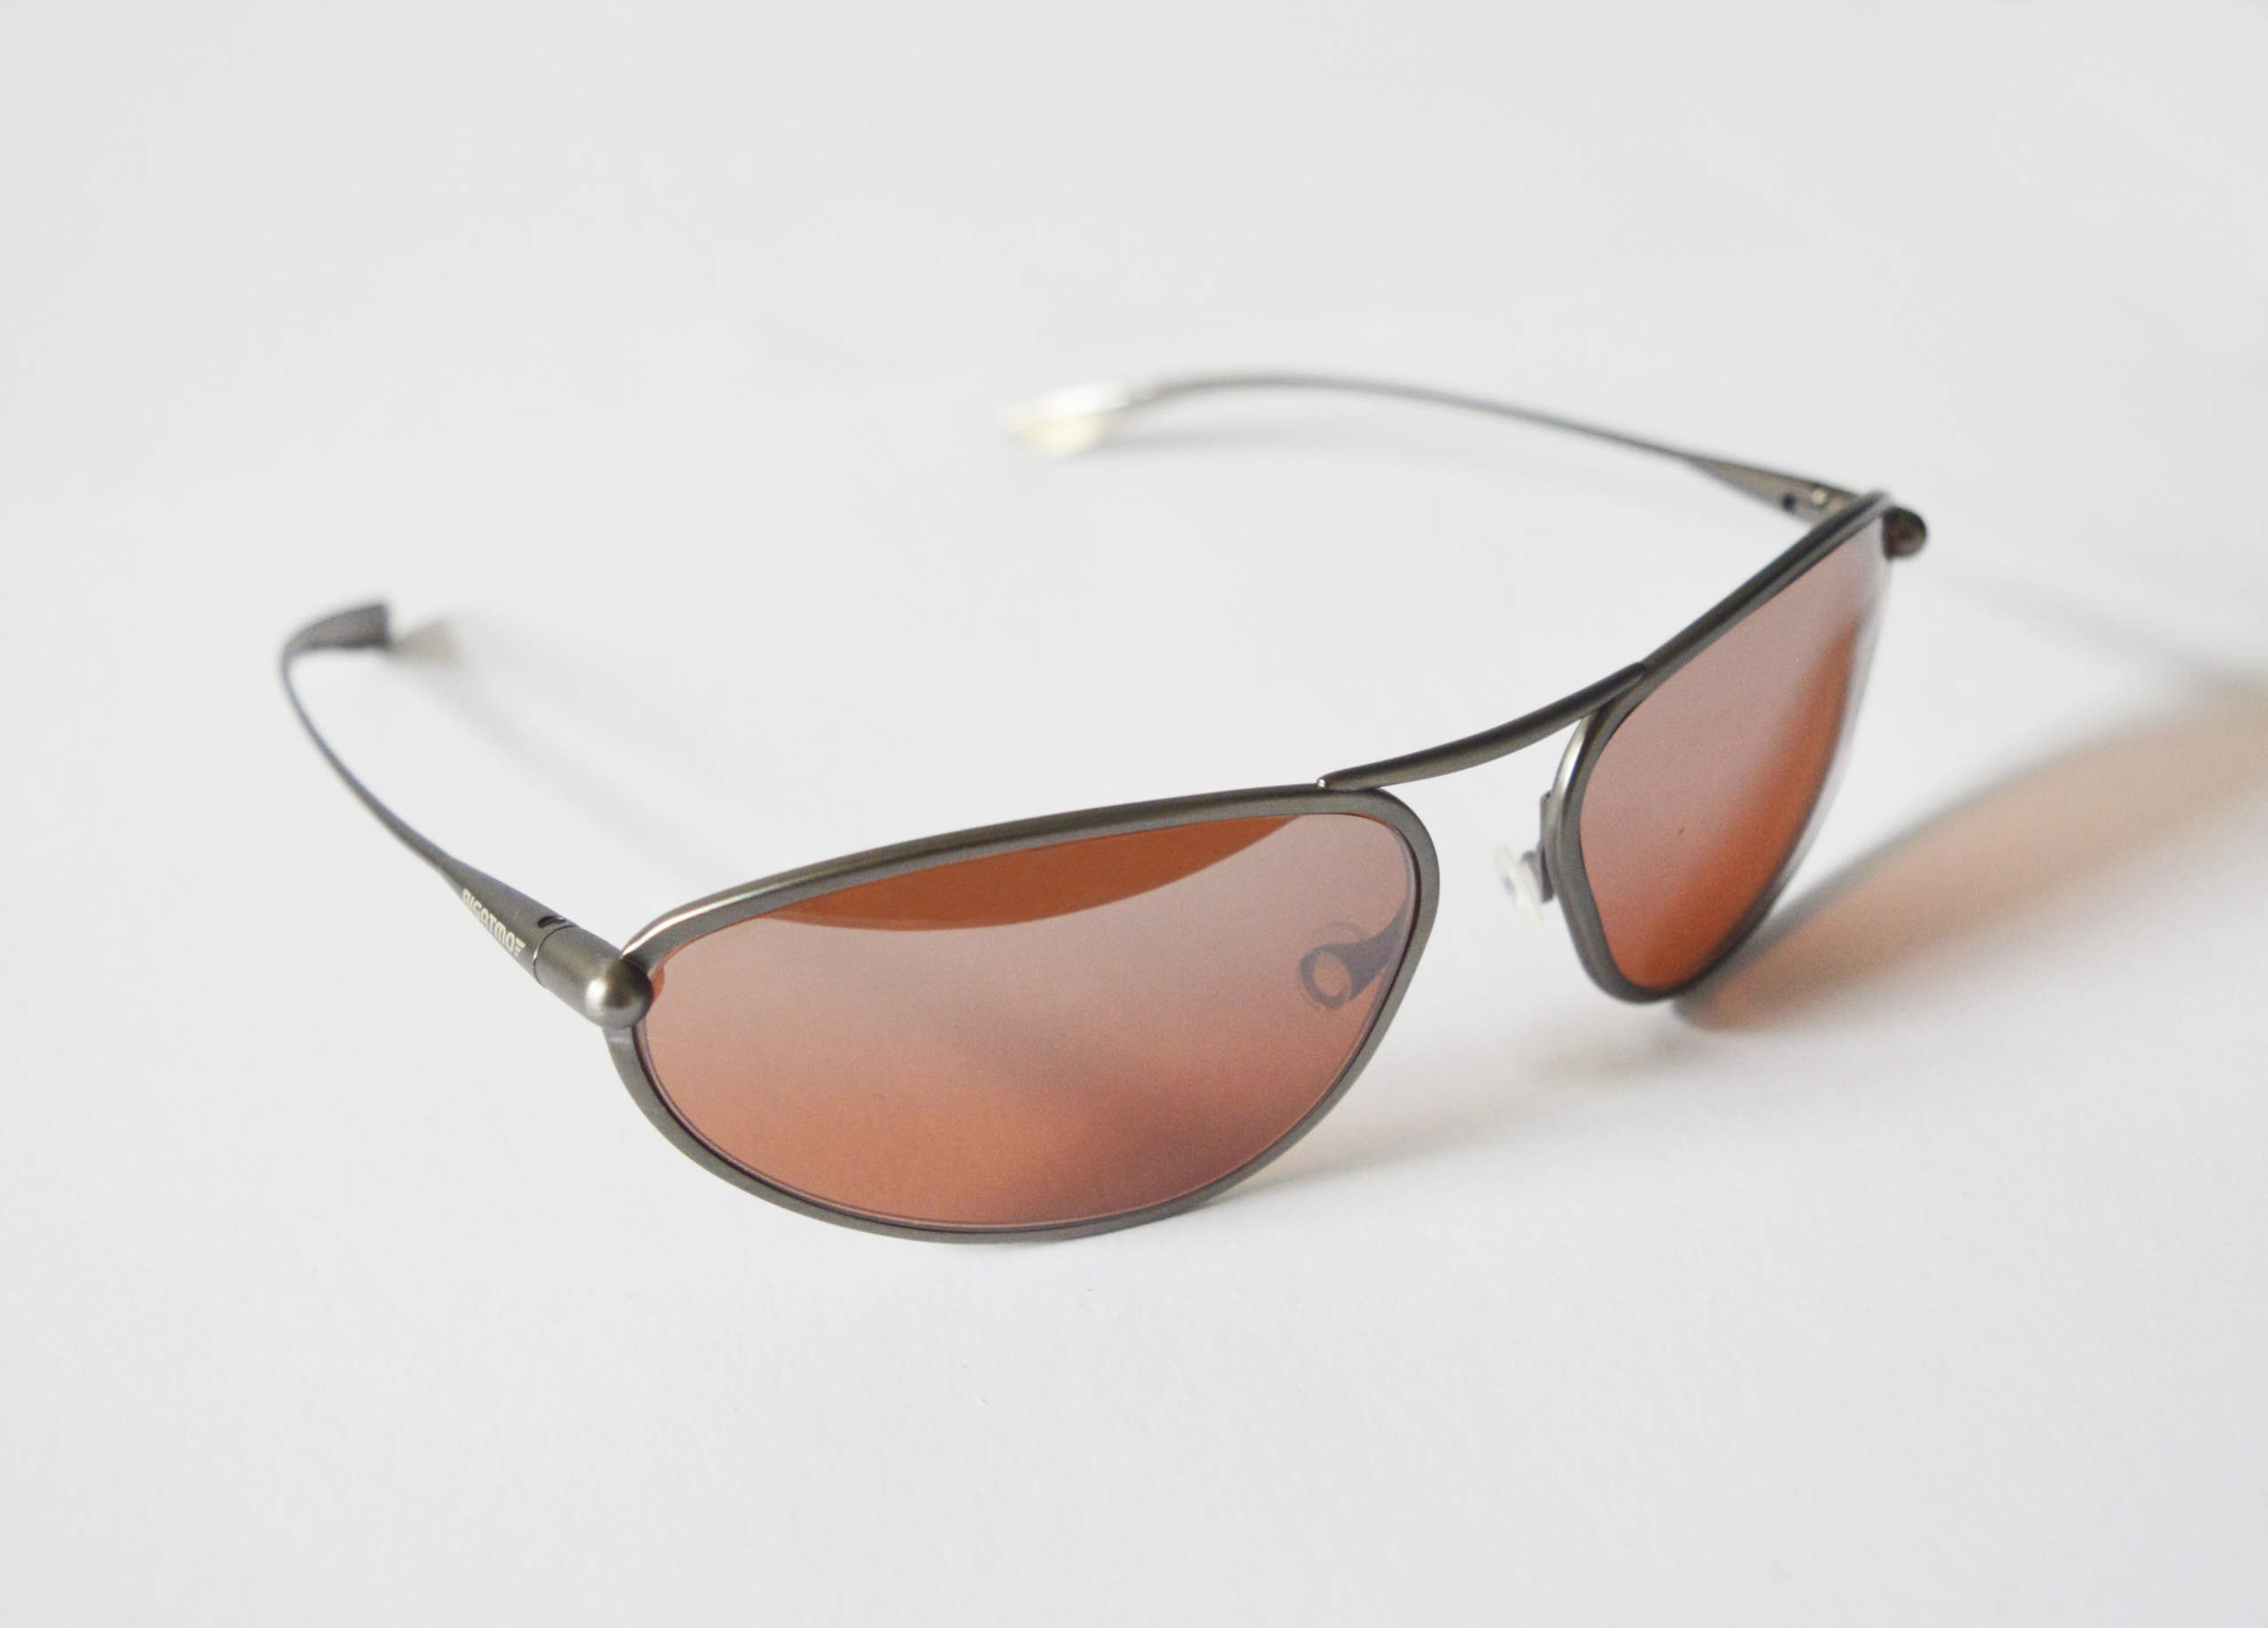 Exo - Gunmetal Titanium Frame Silver Gradient Mirror Photochromic Sunglasses